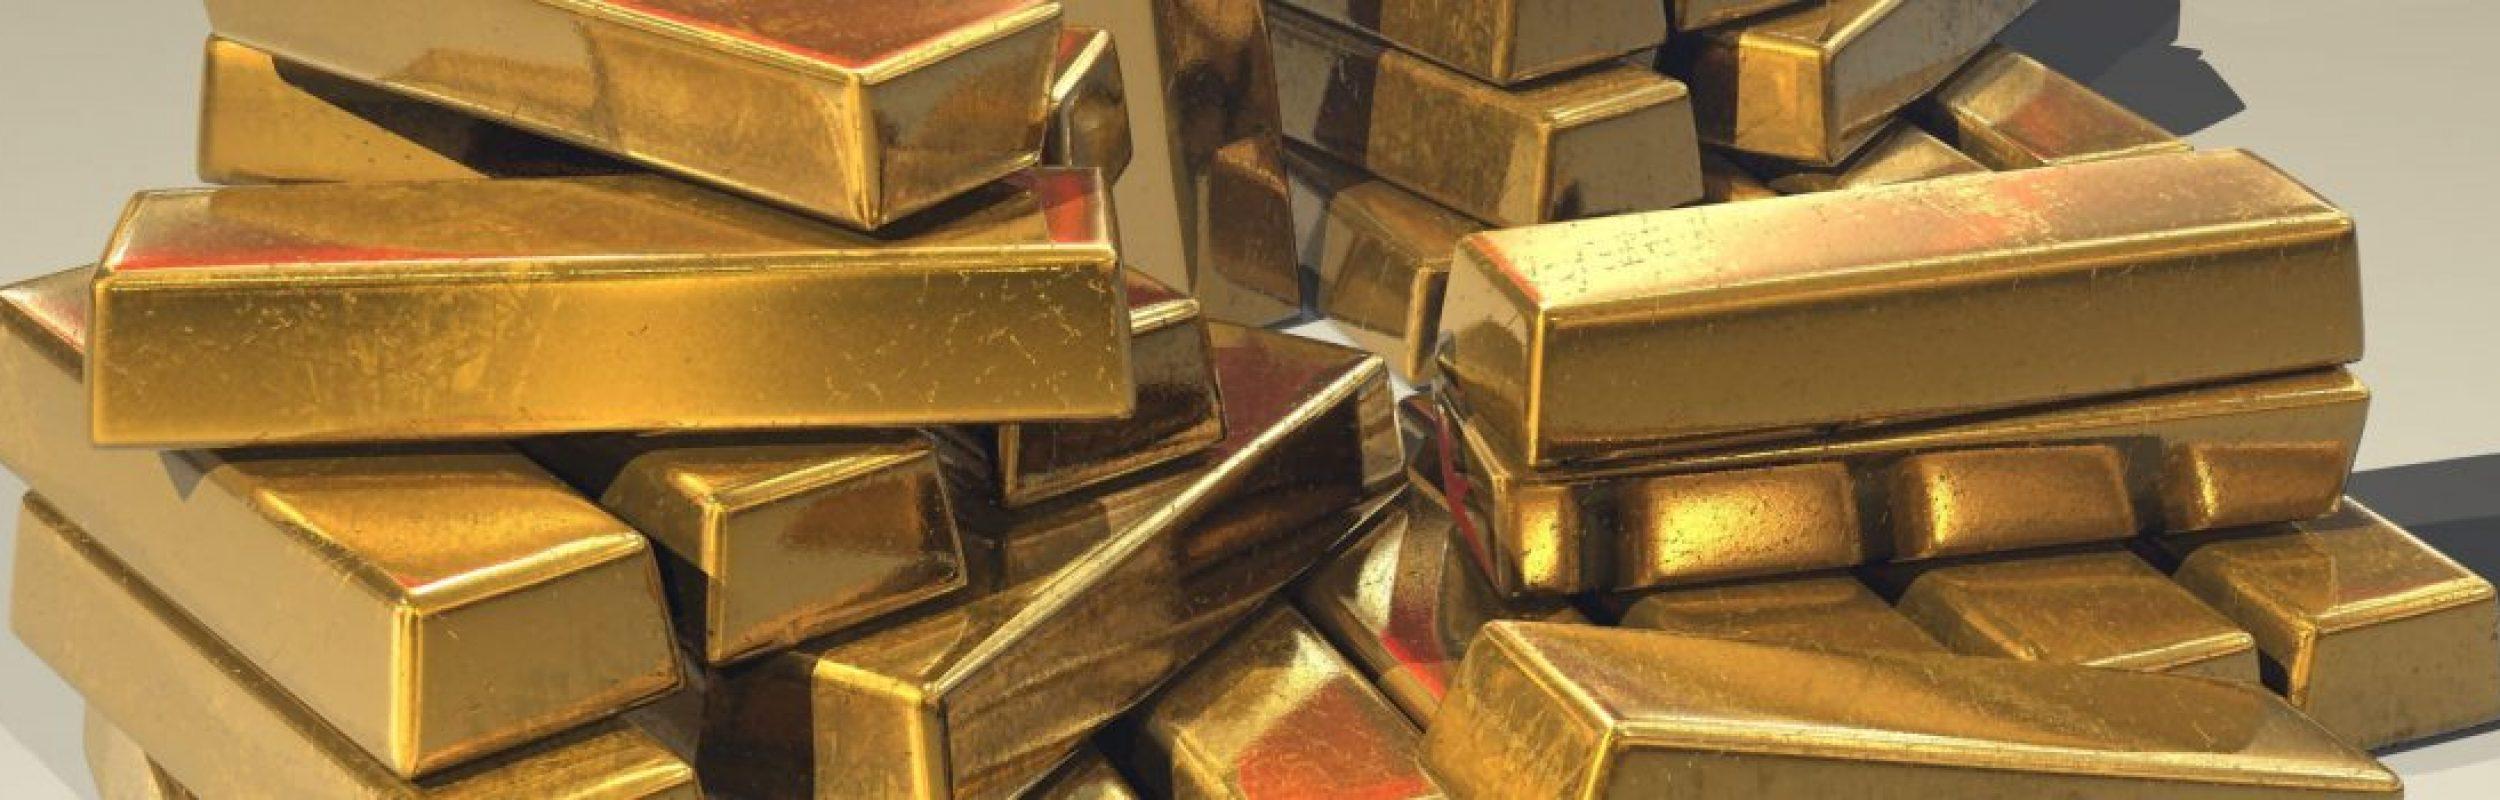 bullion-gold-gold-bars-47047-scaled-on4wgzqt47ryp1eoa5v85yip71dzucivcy4cmoph2k